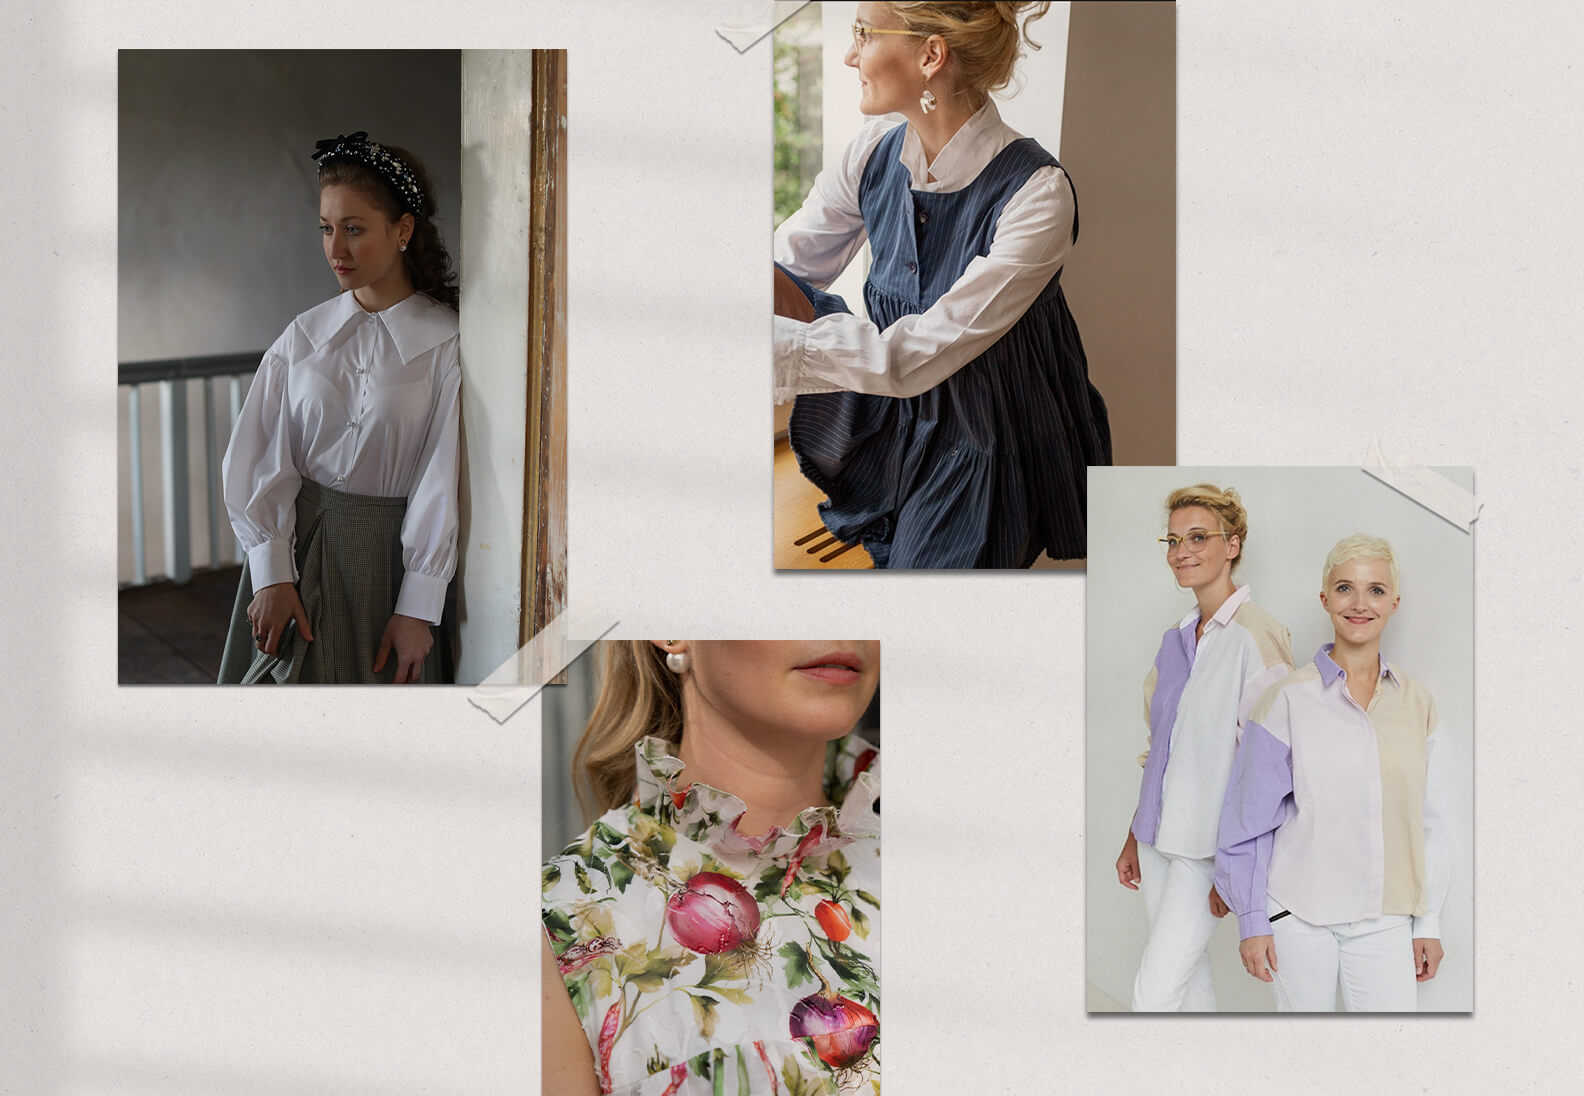 Die Bluse – Jetzt neu im sisterMAGpatterns Shop!